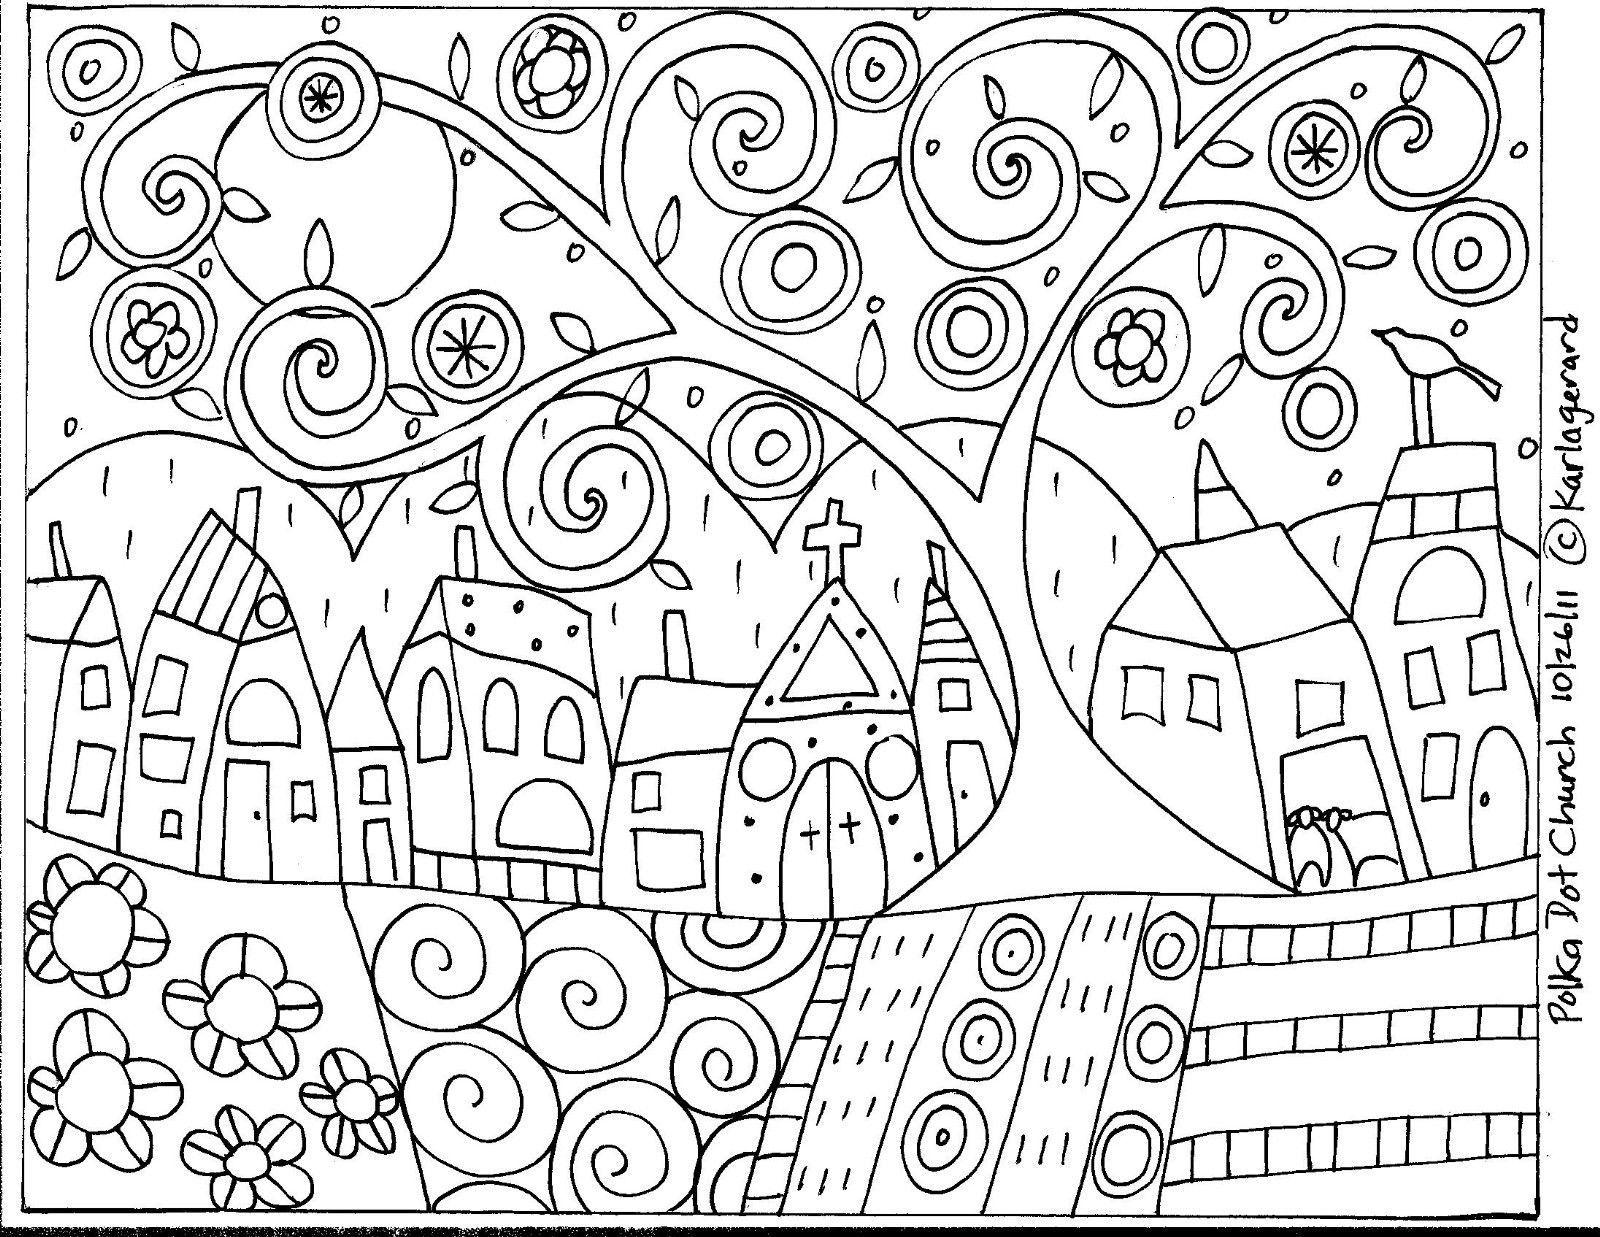 RUG HOOK CRAFT PAPER PATTERN Abstract Winter FOLK ART PRIMITIVE Karla Gerard